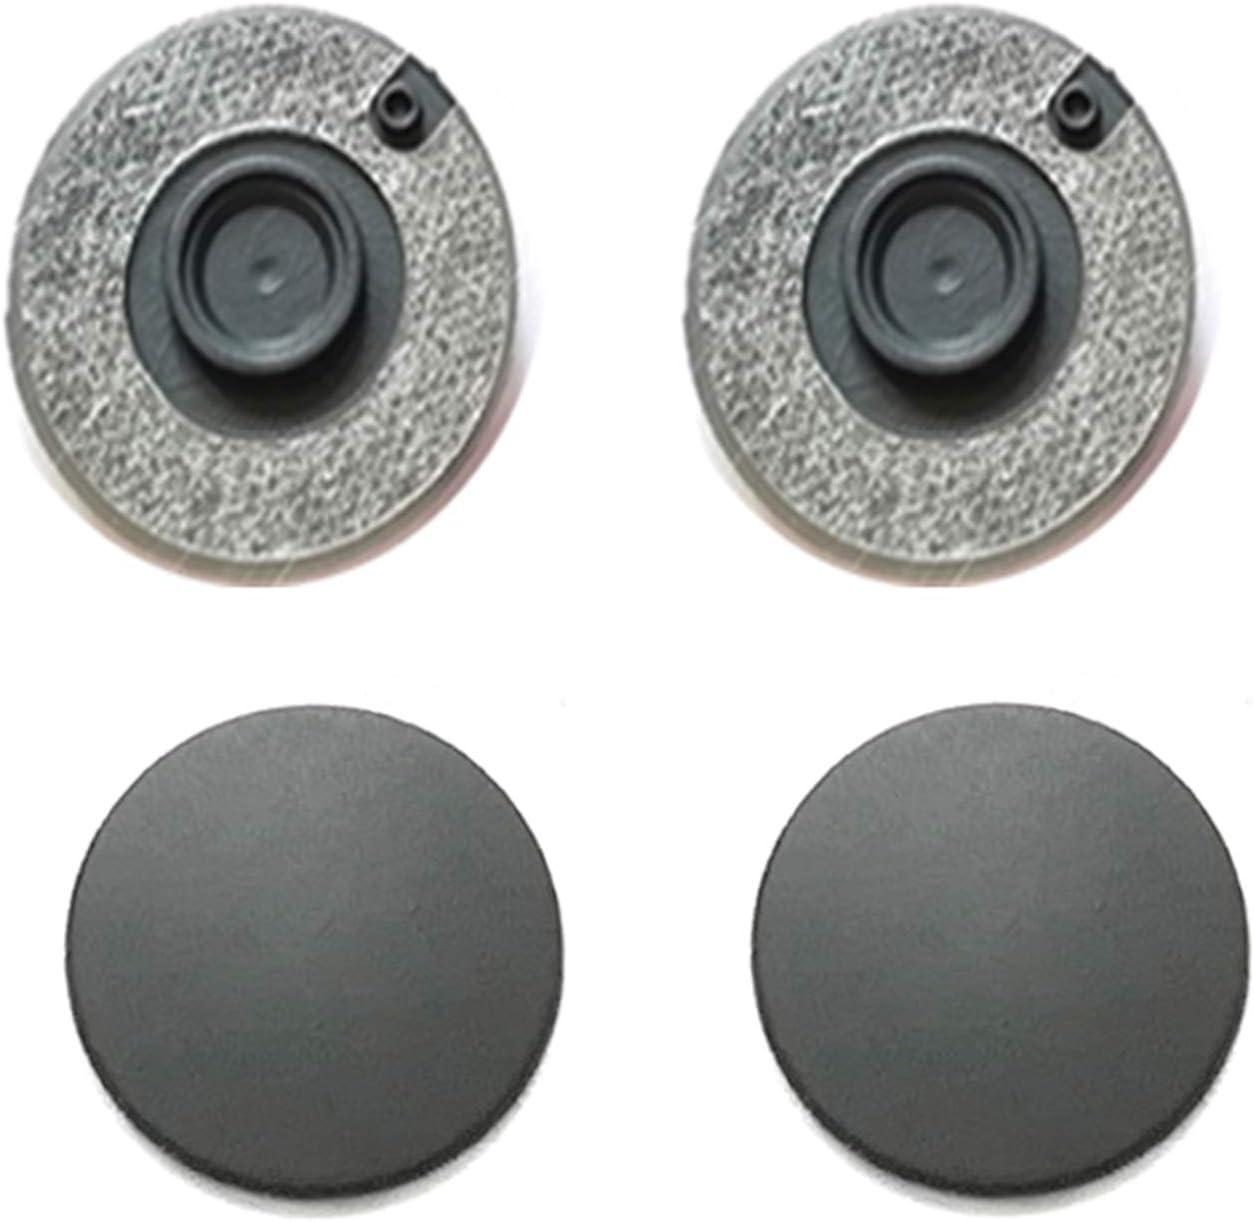 GODSHARK Bottom Base Rubber Feet Foot Pad for Apple MacBook Pro & MacBook Retina A1398 A1425 A1502 (MacBook Retina 2012+)